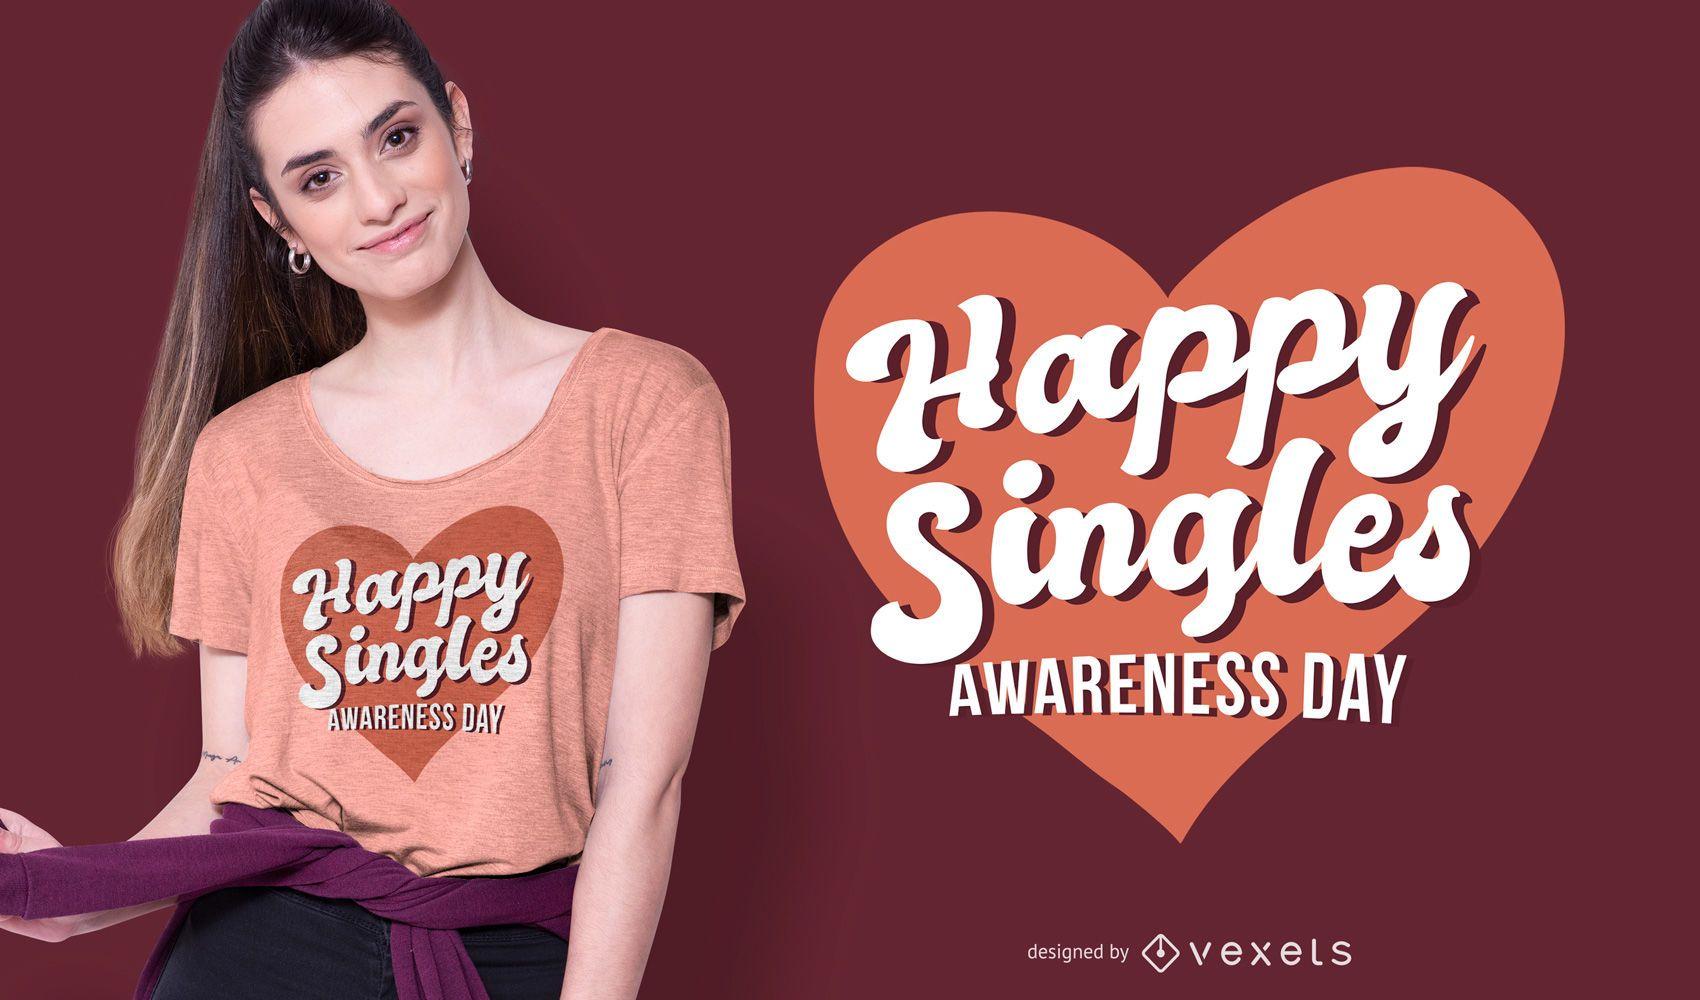 Happy singles day t-shirt design